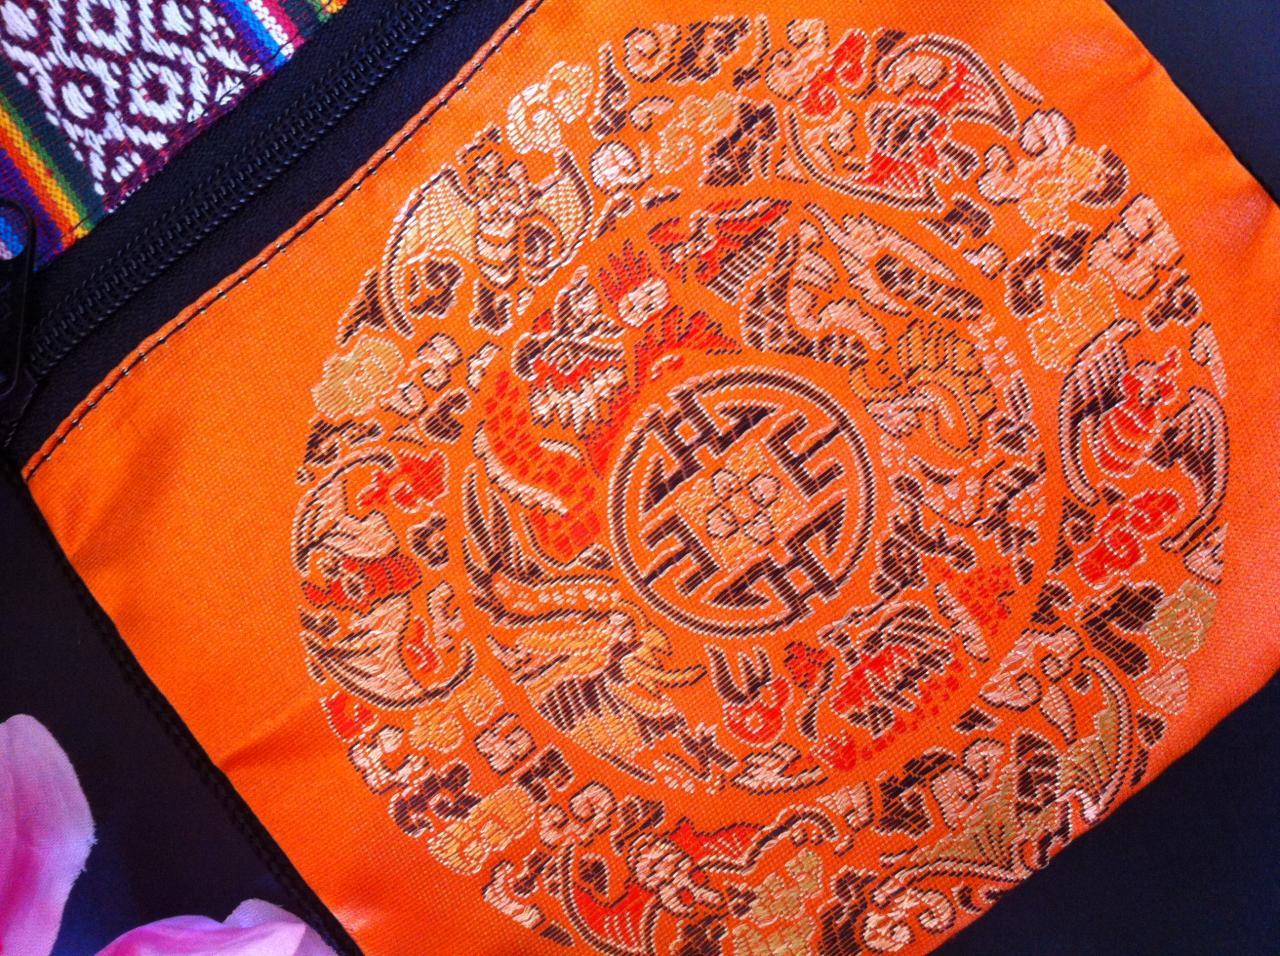 pochette-orange-1a.jpg